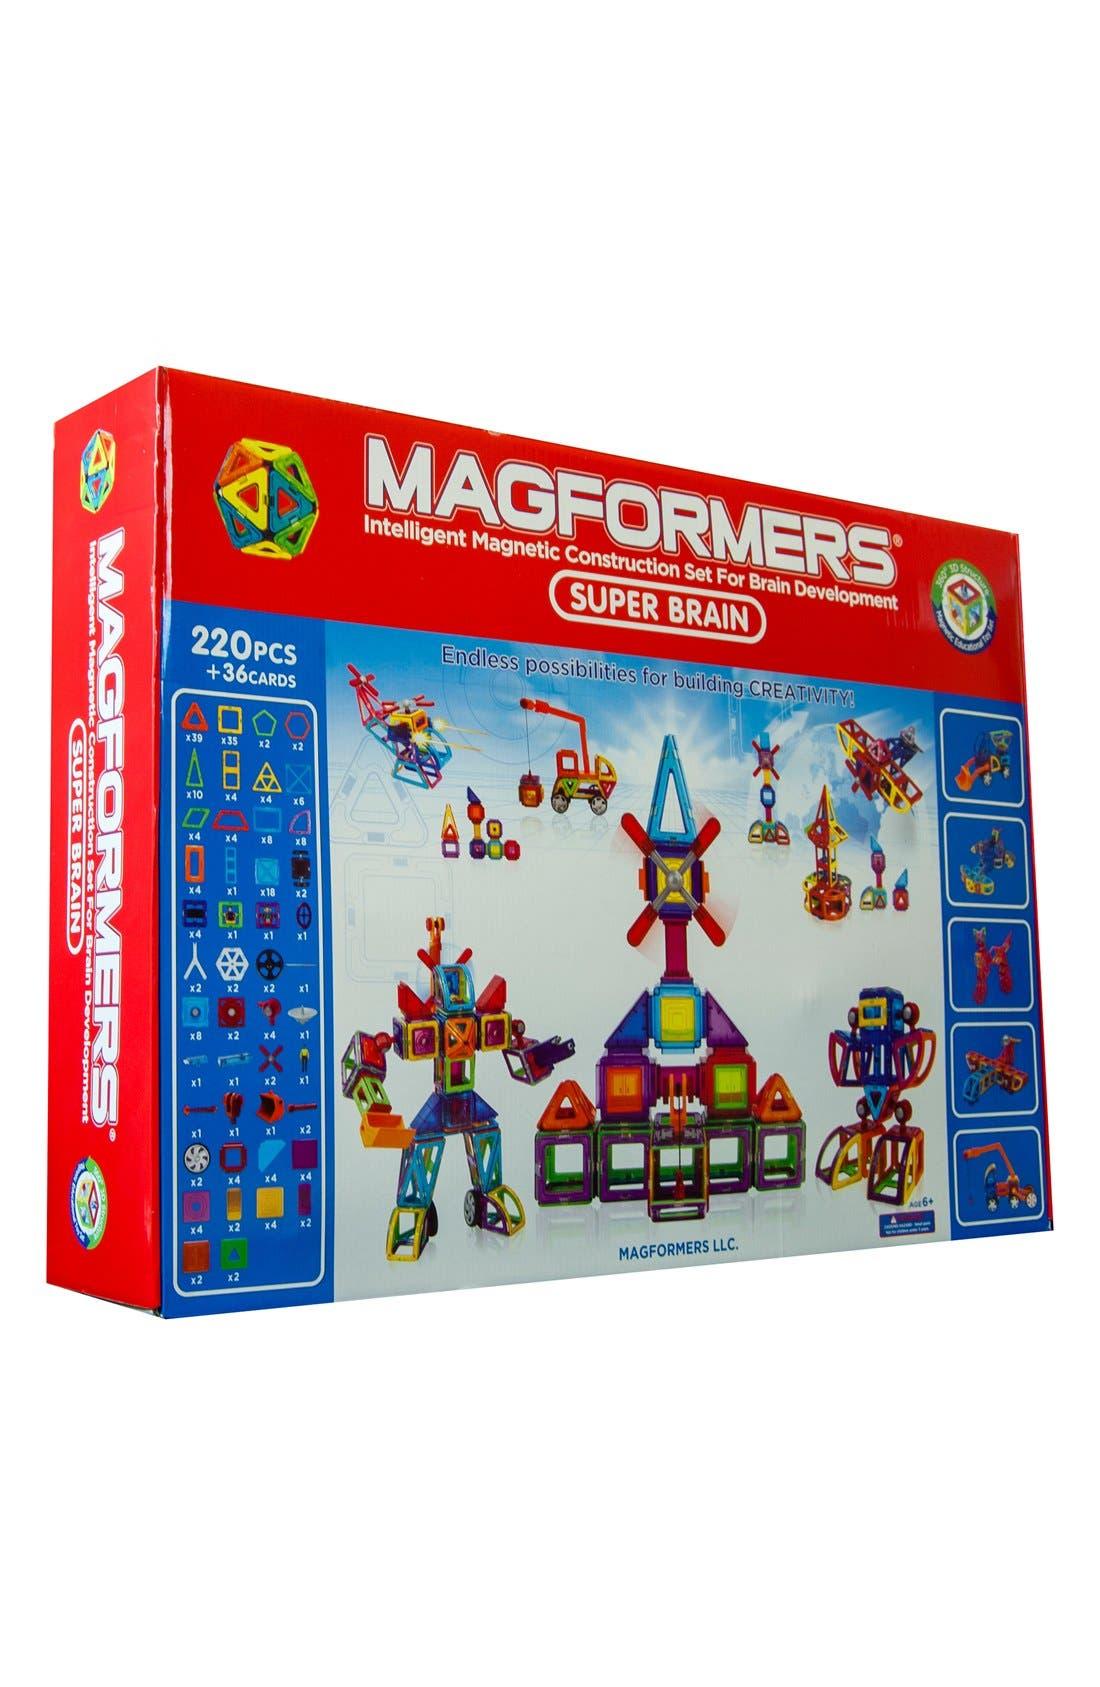 MAGFORMERS 'Super Brain' Construction Set